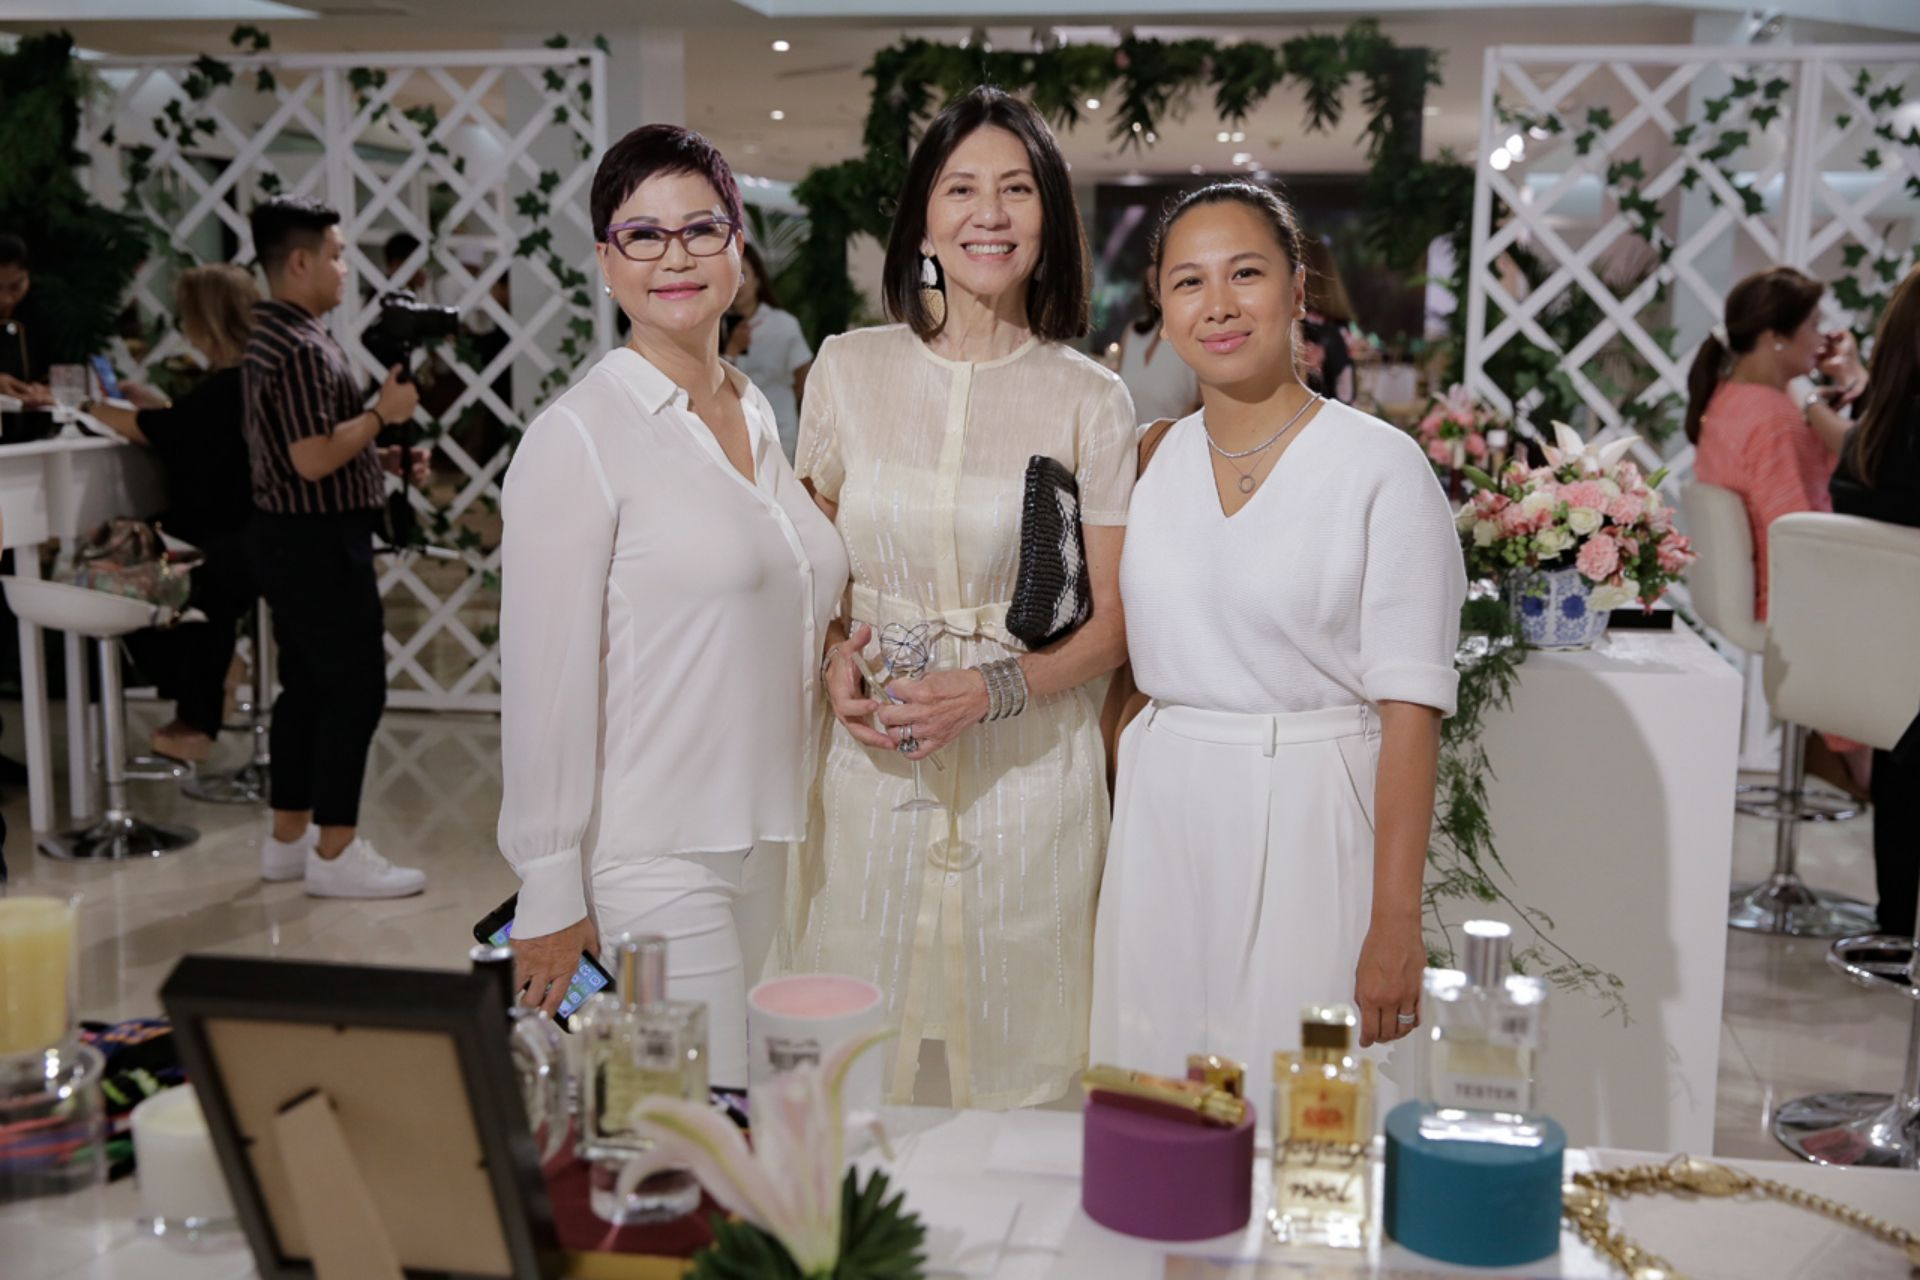 Princess Disini, Lulu Tan Gan and Maureen Disini